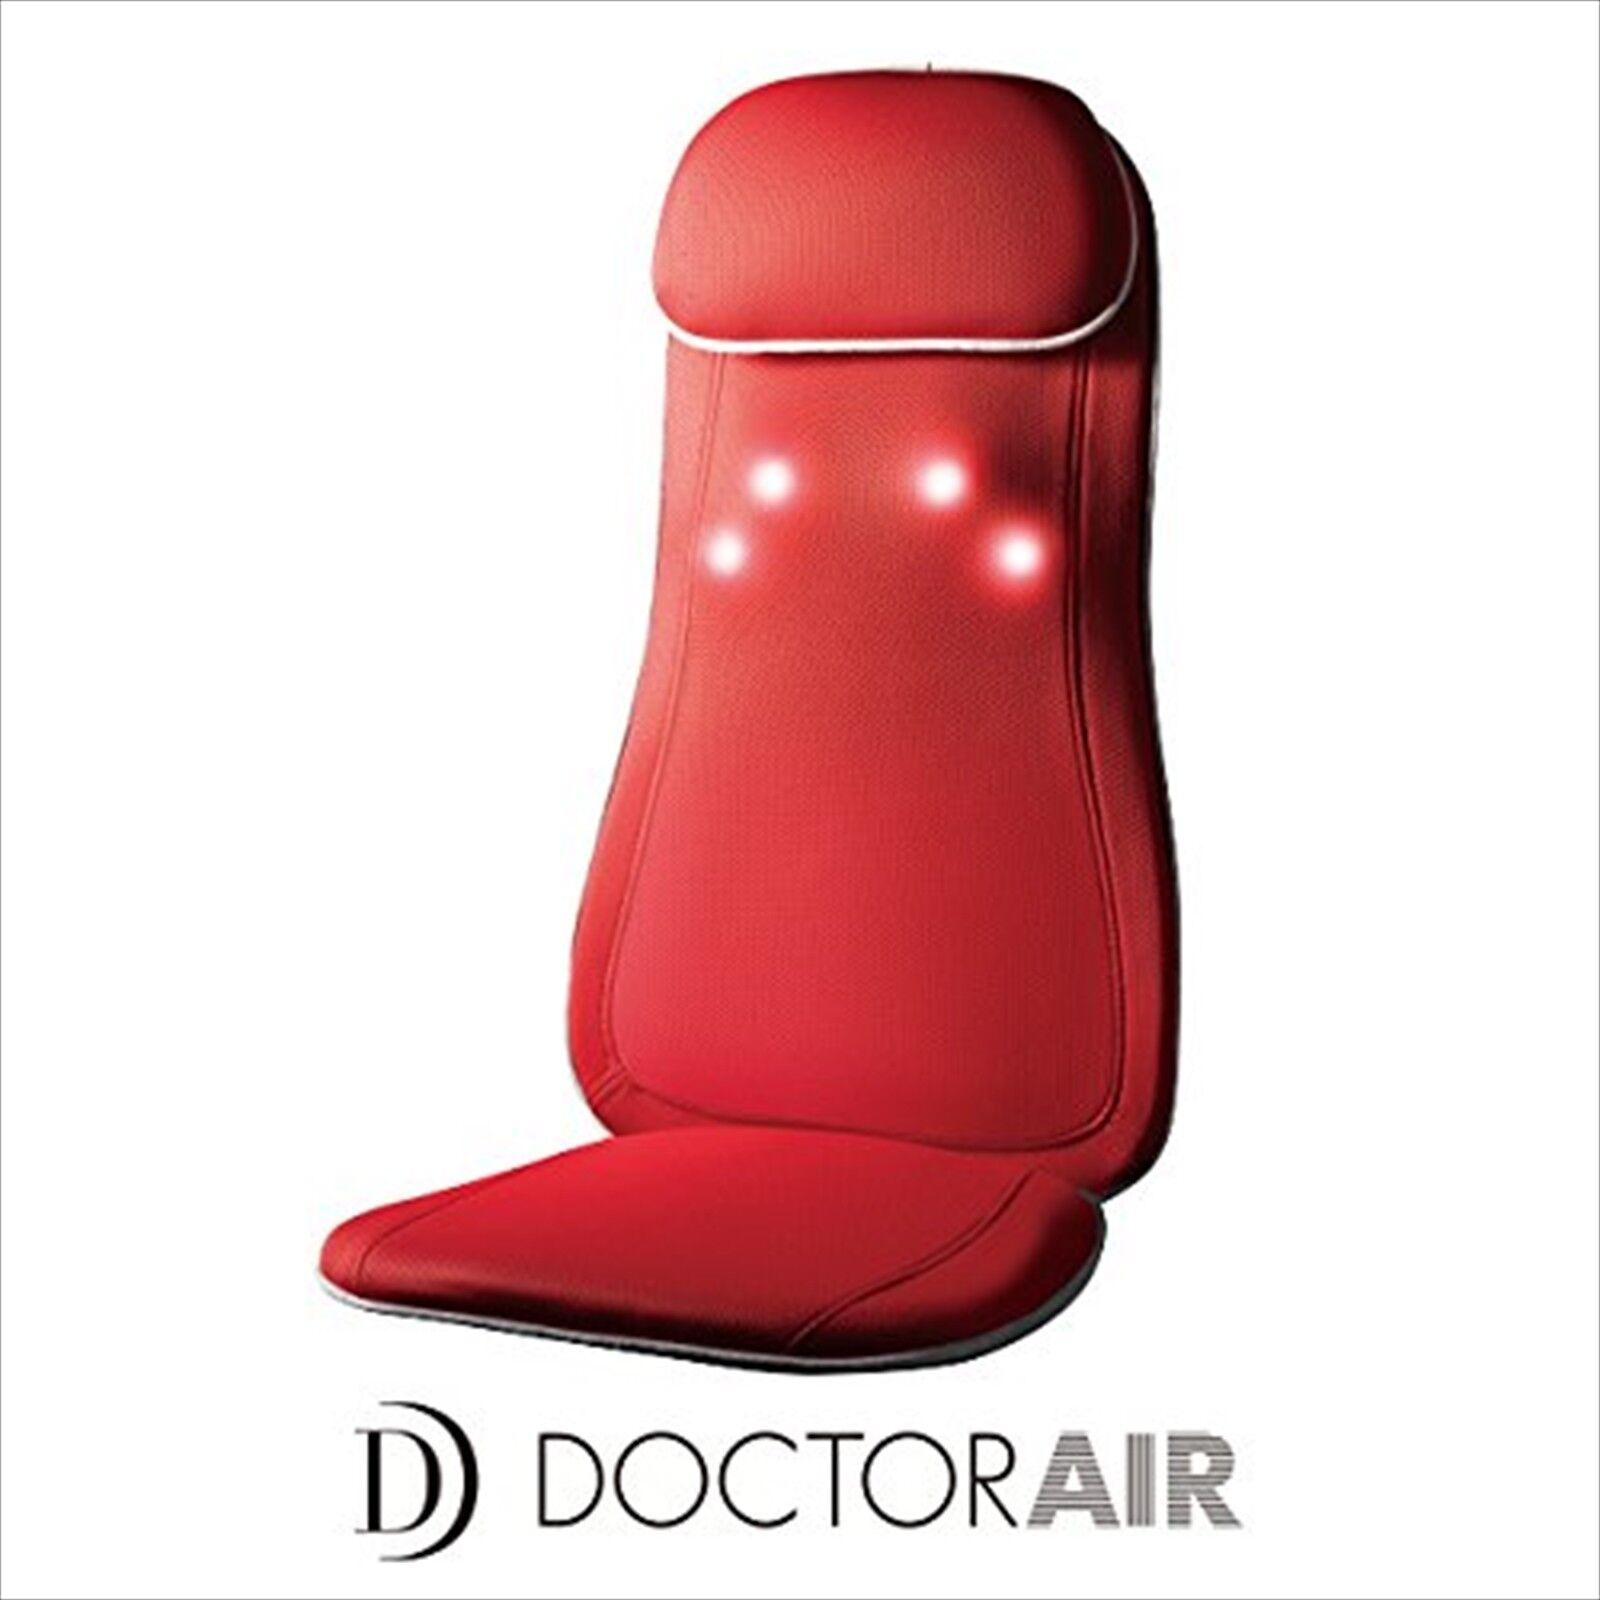 Drr 3d Massage Seat Folding Portable Massager Chair Red Japan